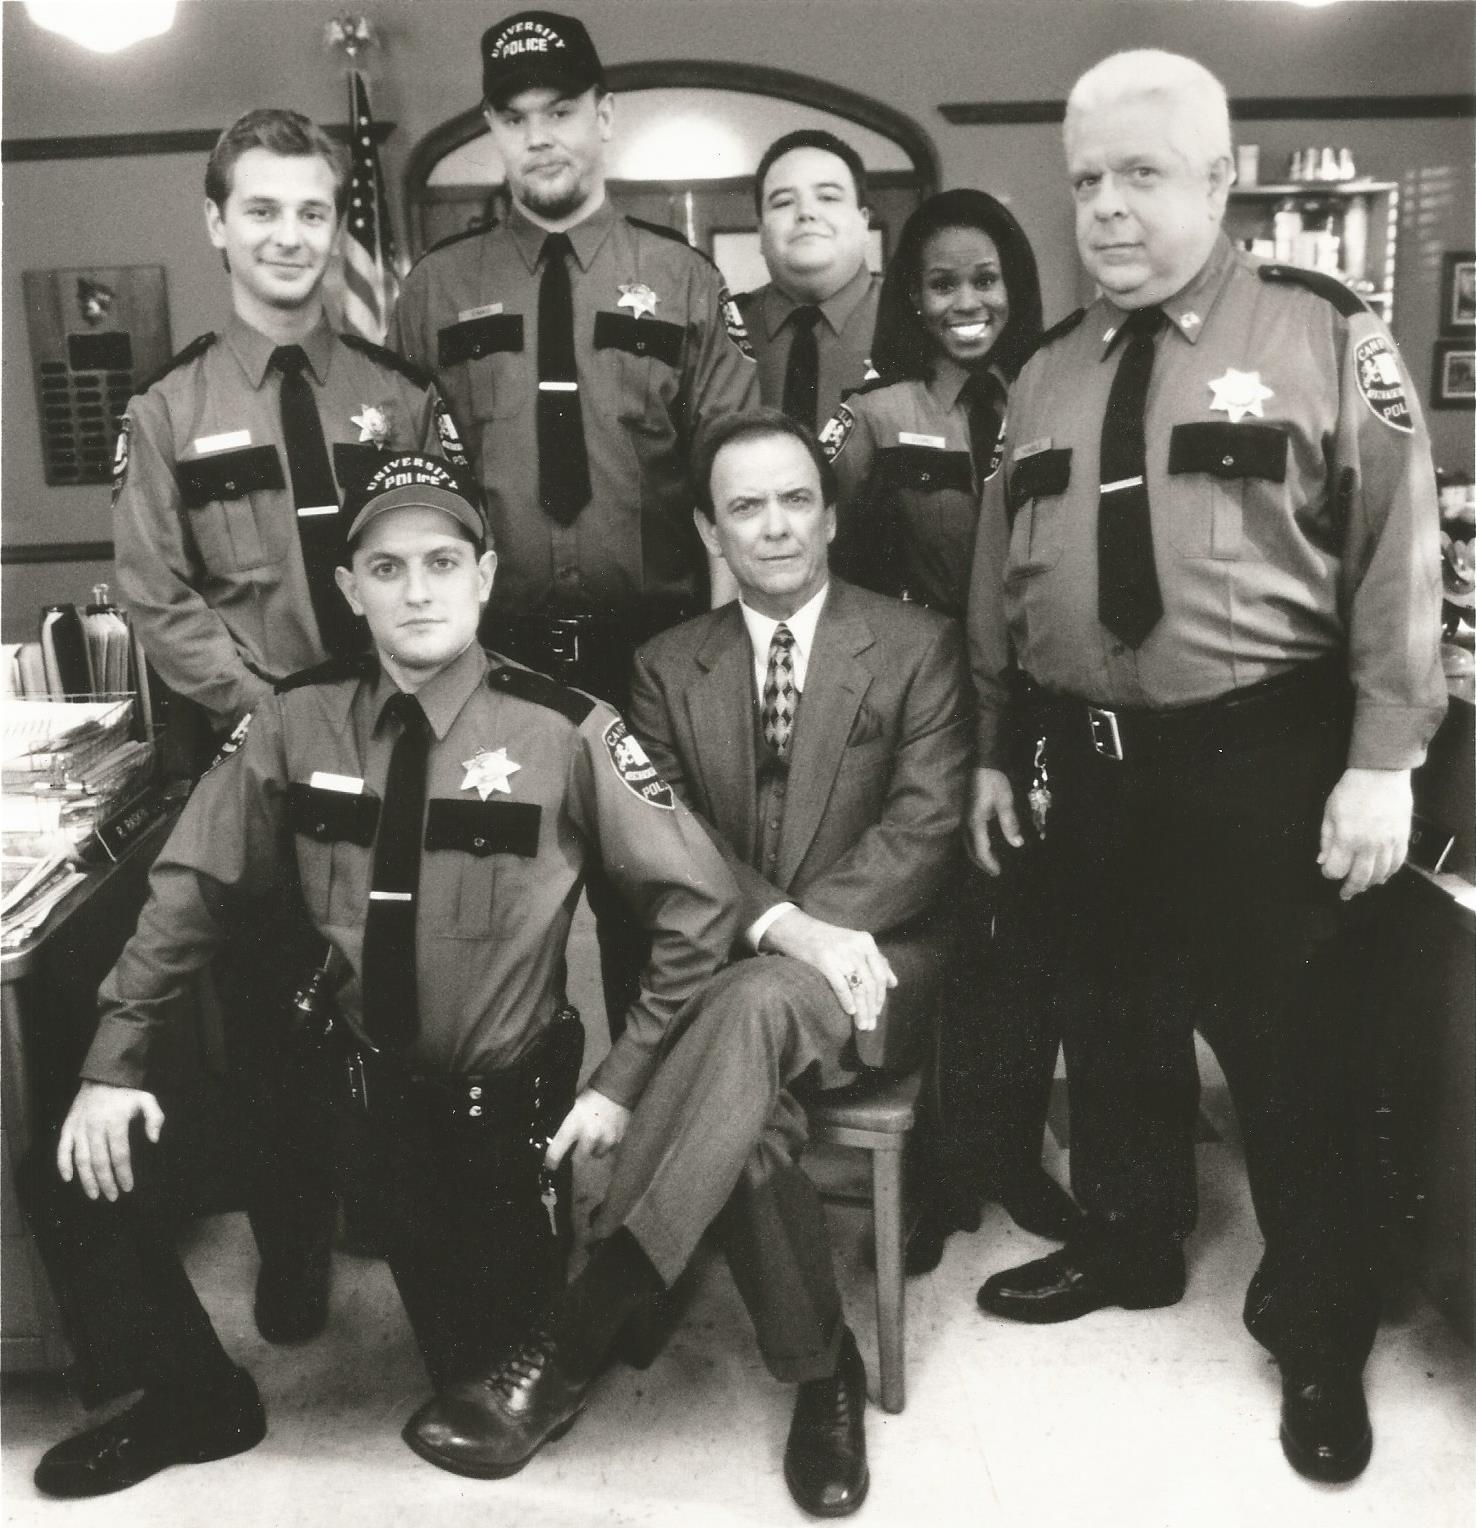 Ben Bode, JD Cullum, Ryan Hurst, Jerry Kernion, Monte Markham, David Sage, and LaRita Shelby in Campus Cops (1995)